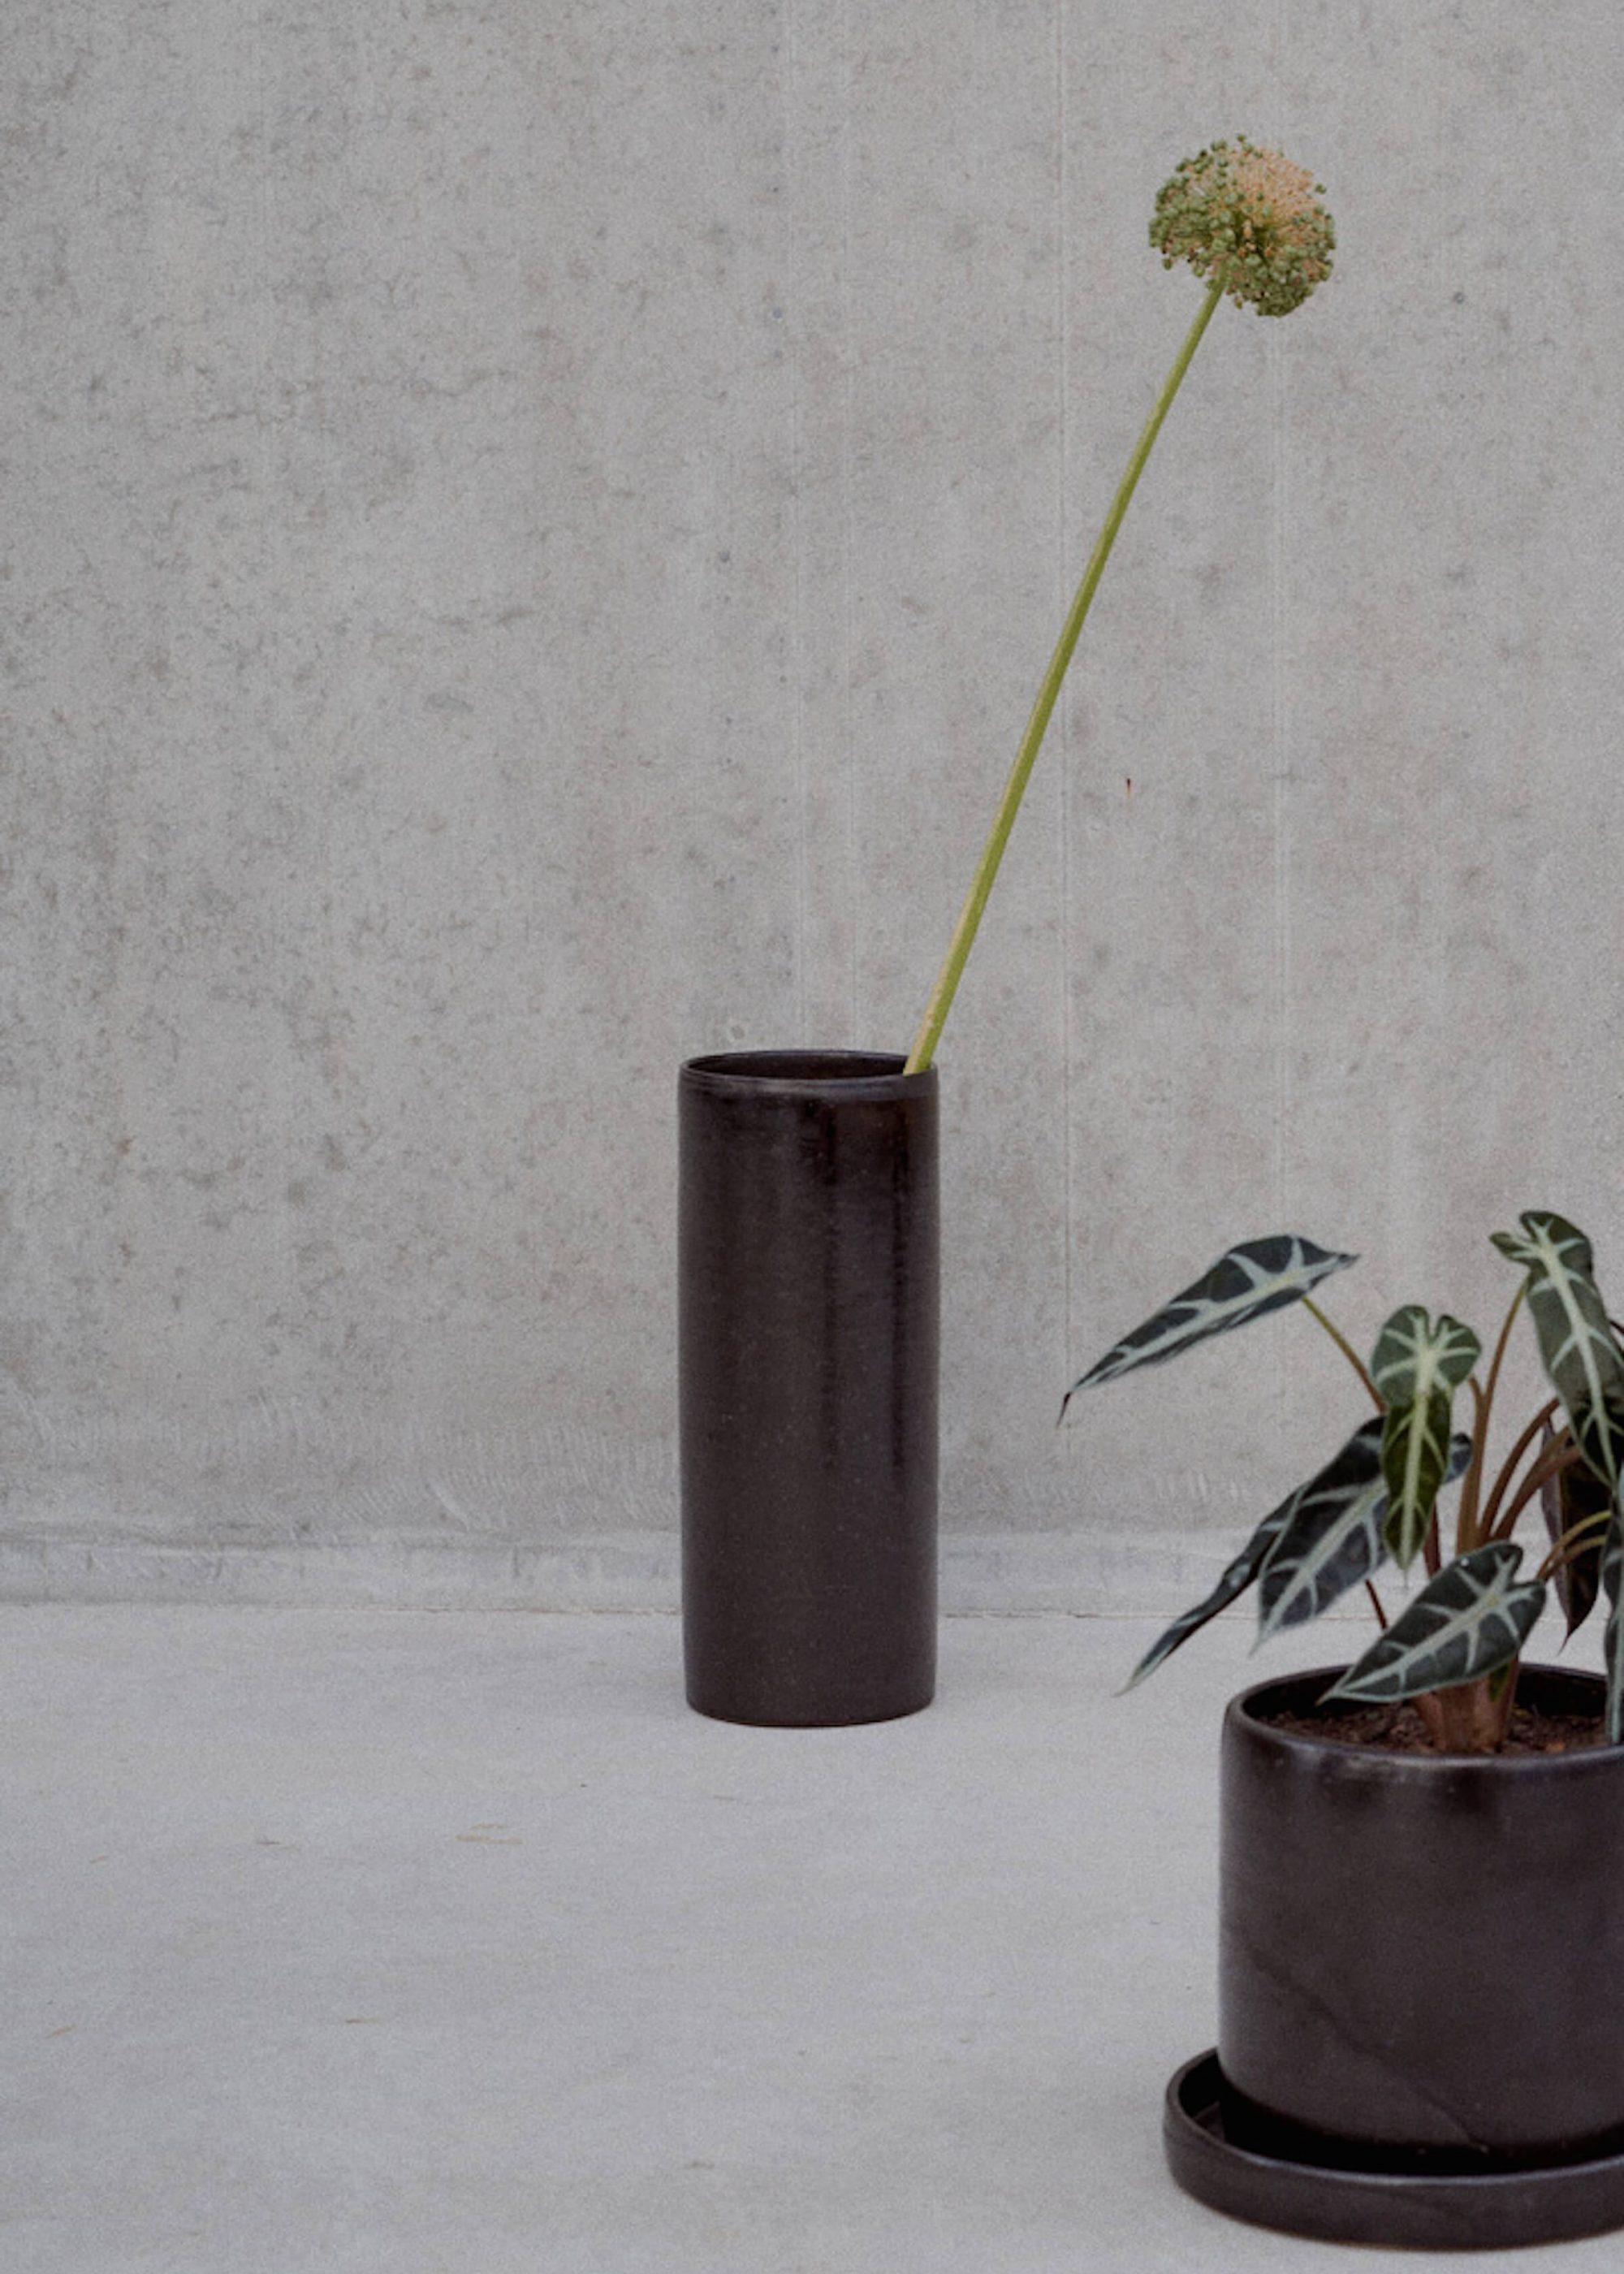 Product image for N° ICG1 Torus I Vase L